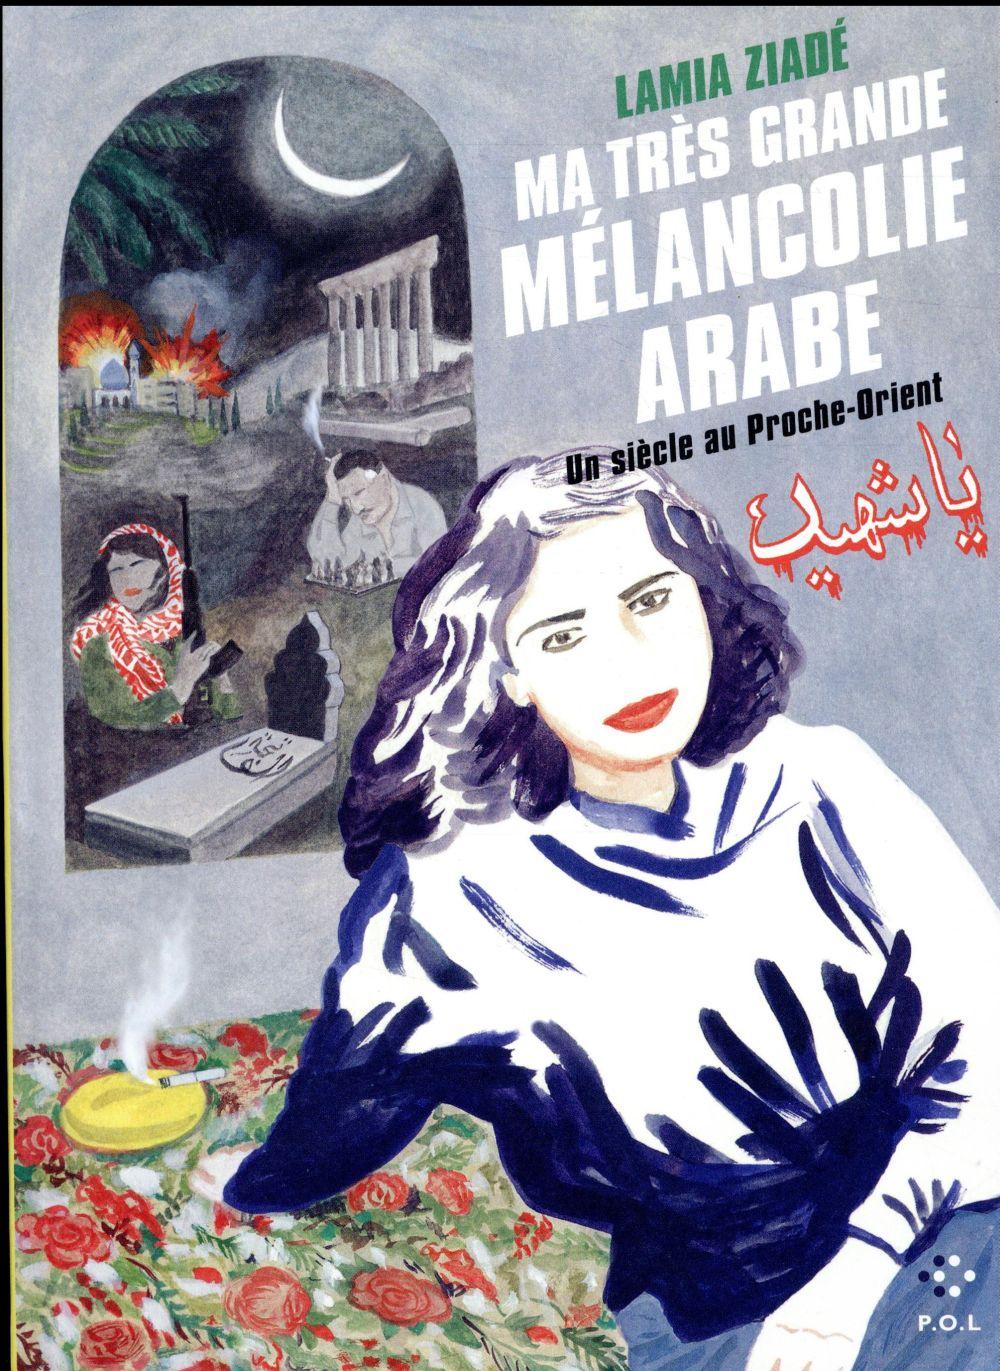 Ma Tres Grande Melancolie Arabe